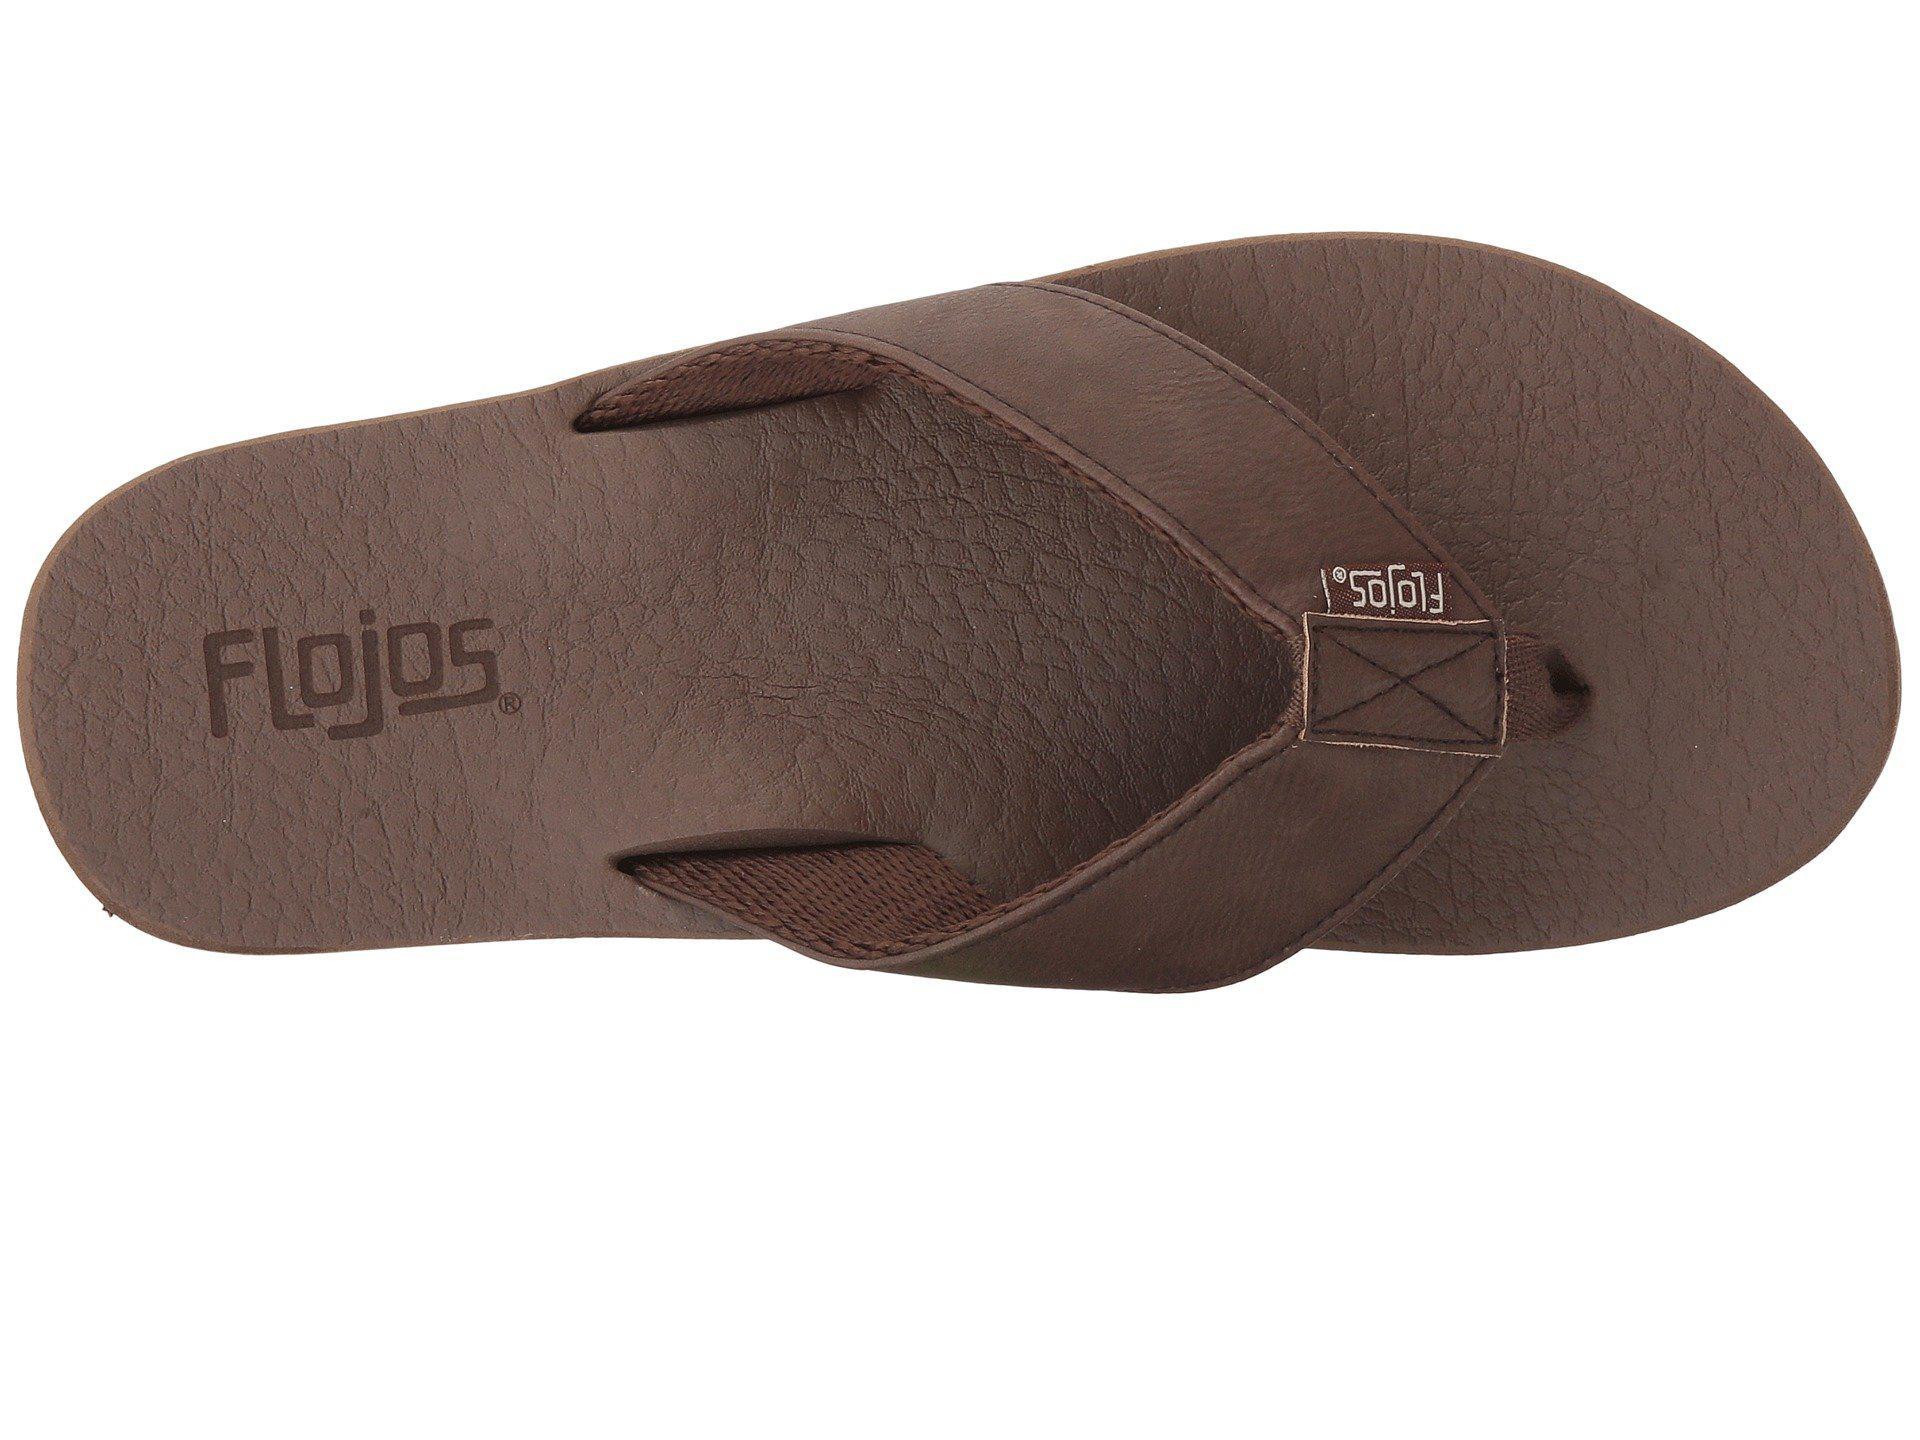 29f7c1ac144ec7 Lyst - Flojos Chase (black) Men s Sandals in Brown for Men - Save ...